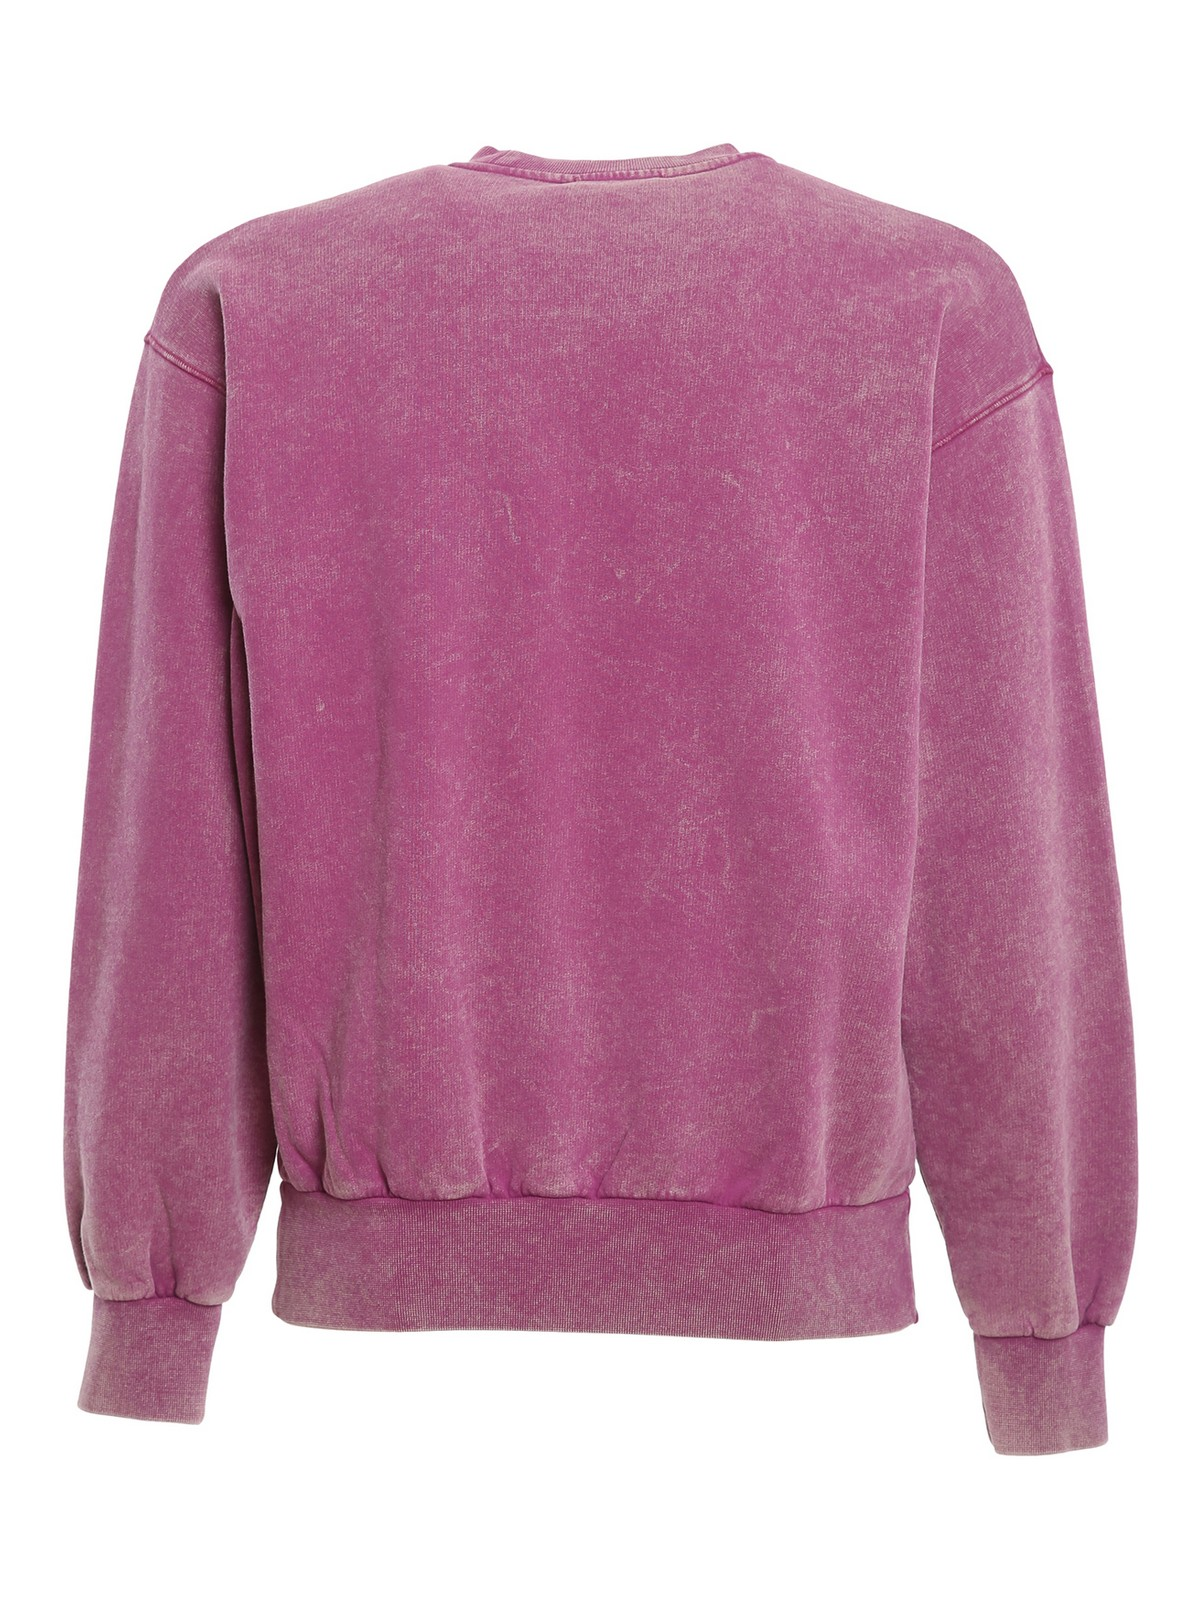 Picture of Aries   No Problemo Sweatshirt